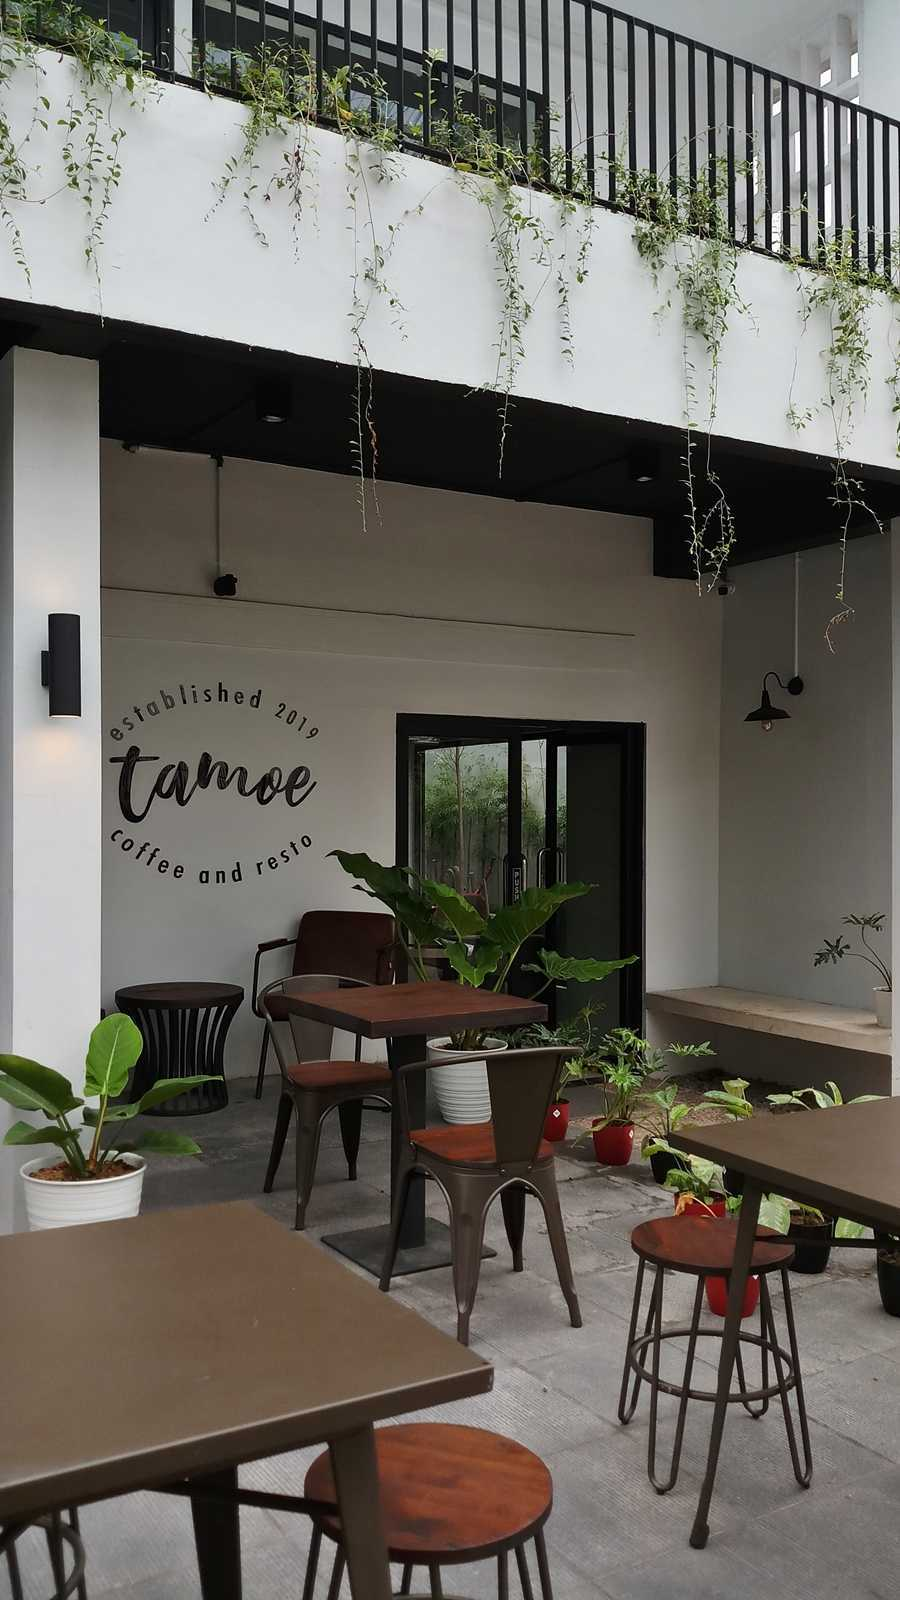 Bd Studio Tamoe Coffee & Resto Medan, Kota Medan, Sumatera Utara, Indonesia Medan, Kota Medan, Sumatera Utara, Indonesia Bd-Studio-Tamoe-Coffee-Resto  80740